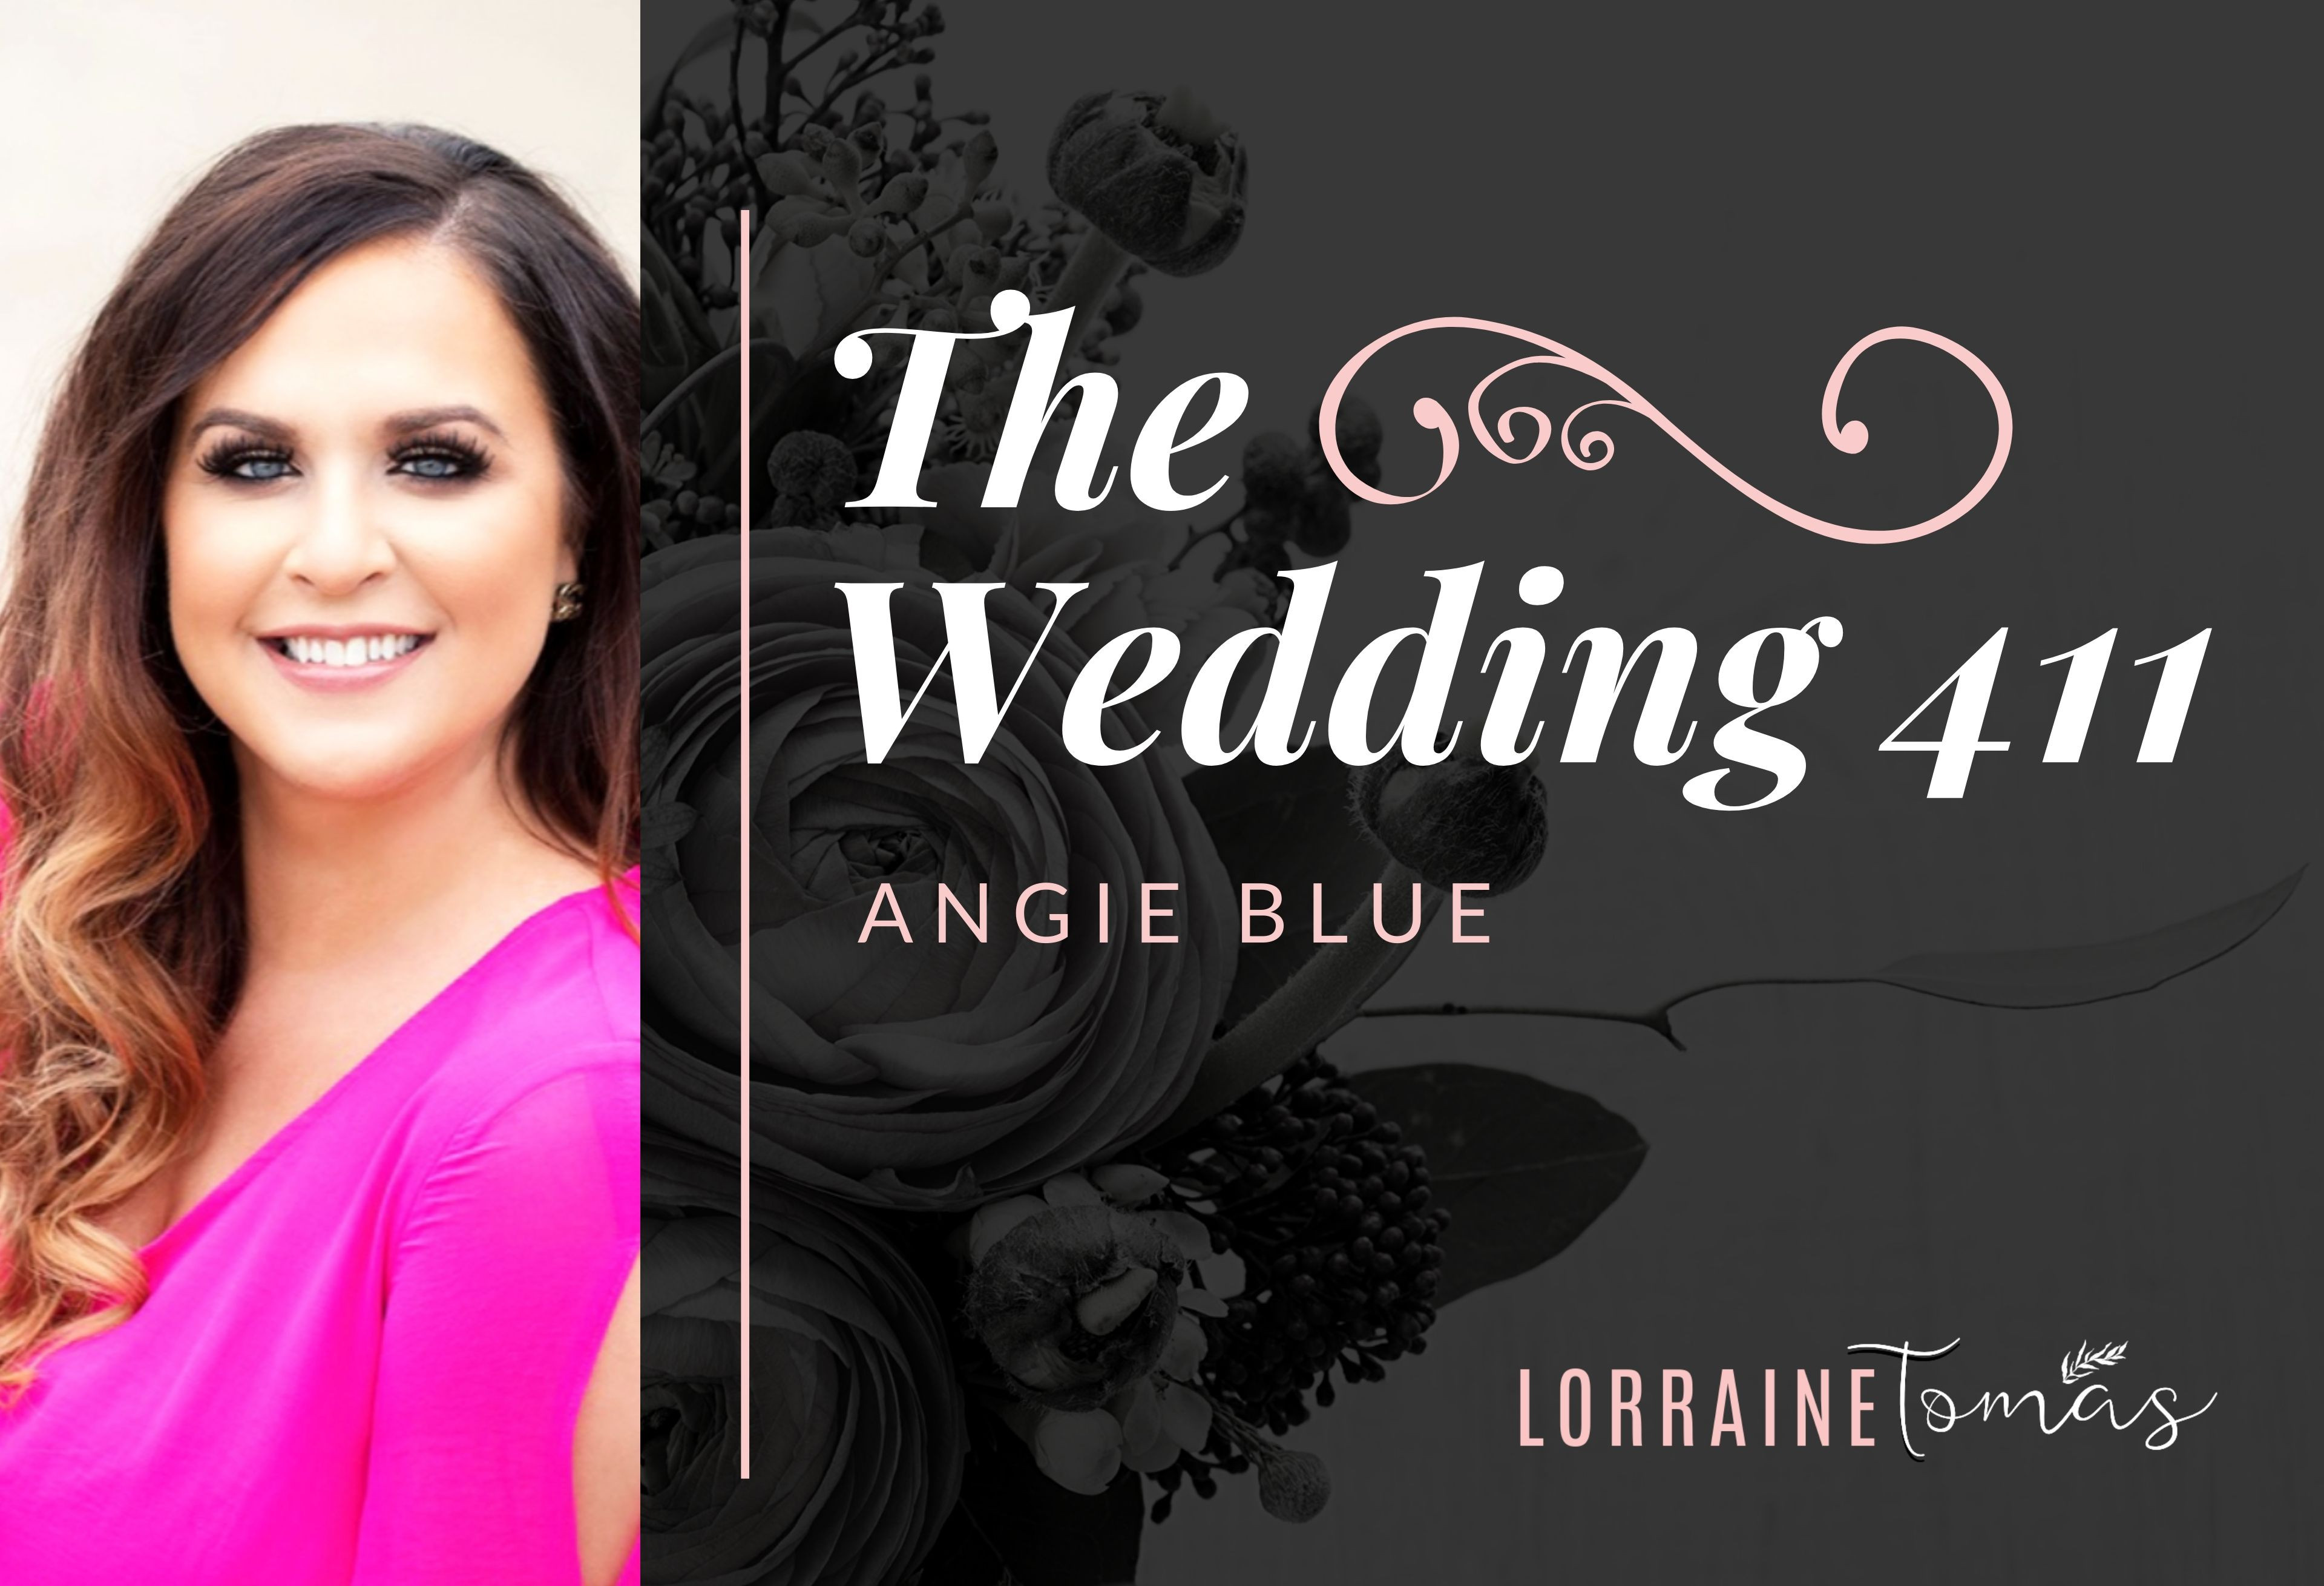 The Wedding 411 - Angie Blue